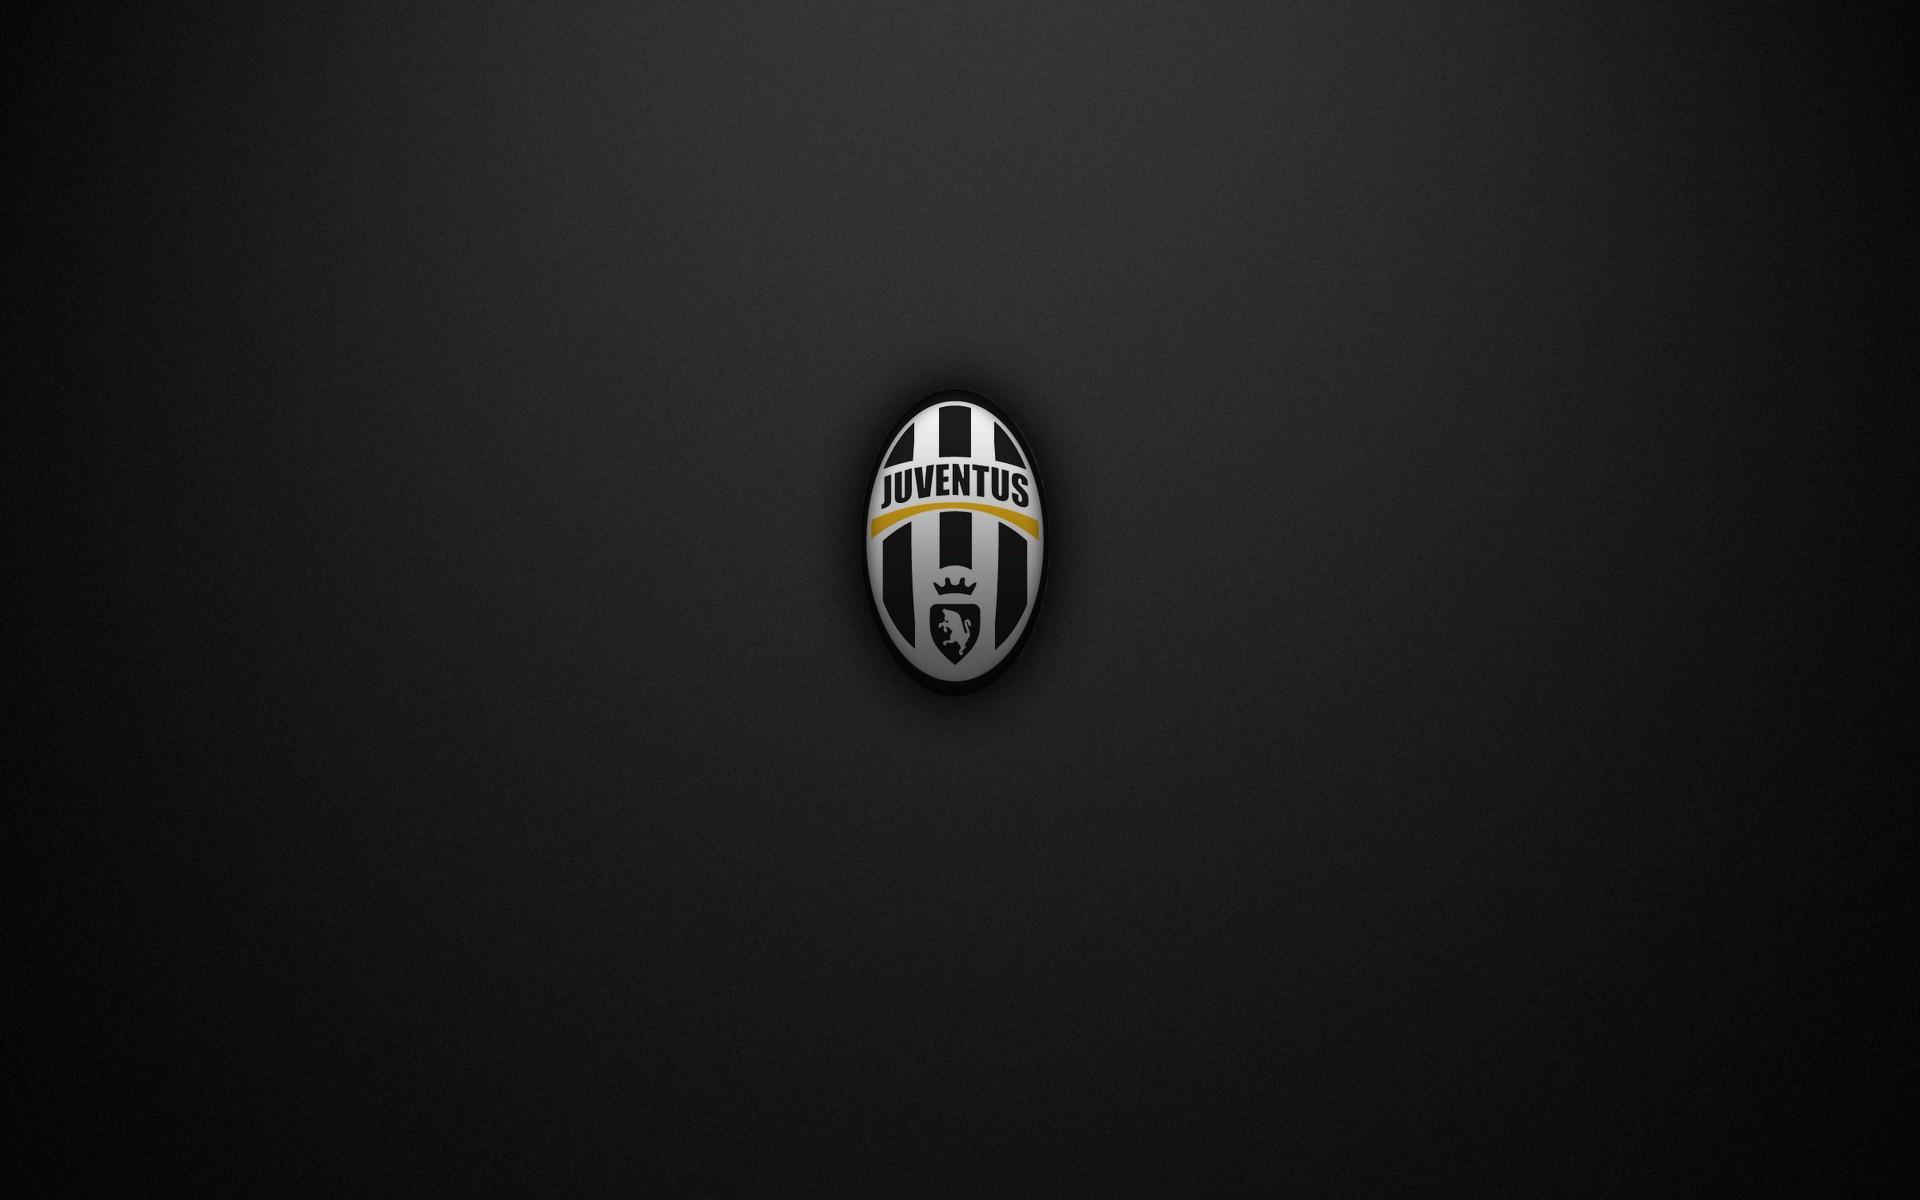 Sfondi Monocromo Sport Logo Cerchio Calcio Marca Juventus